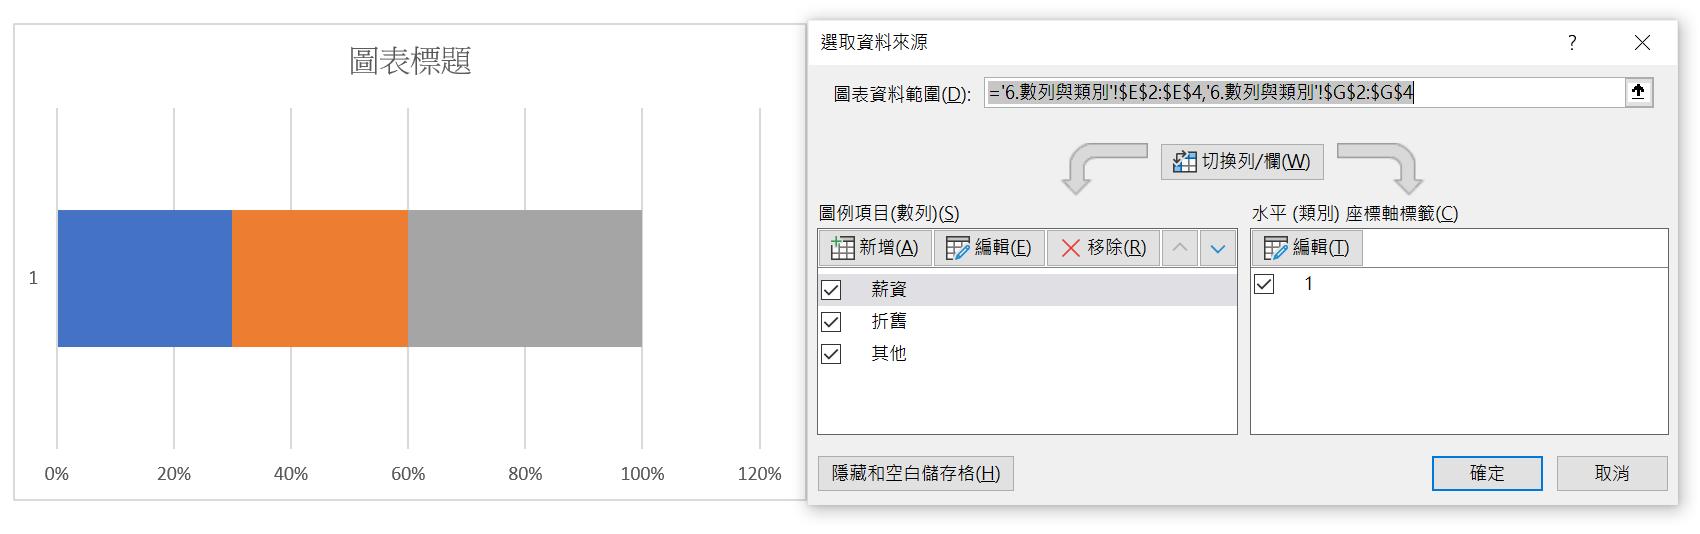 Excel編製圓形圖及堆疊橫條圖,統計費用百分比 圖表設計 第6張